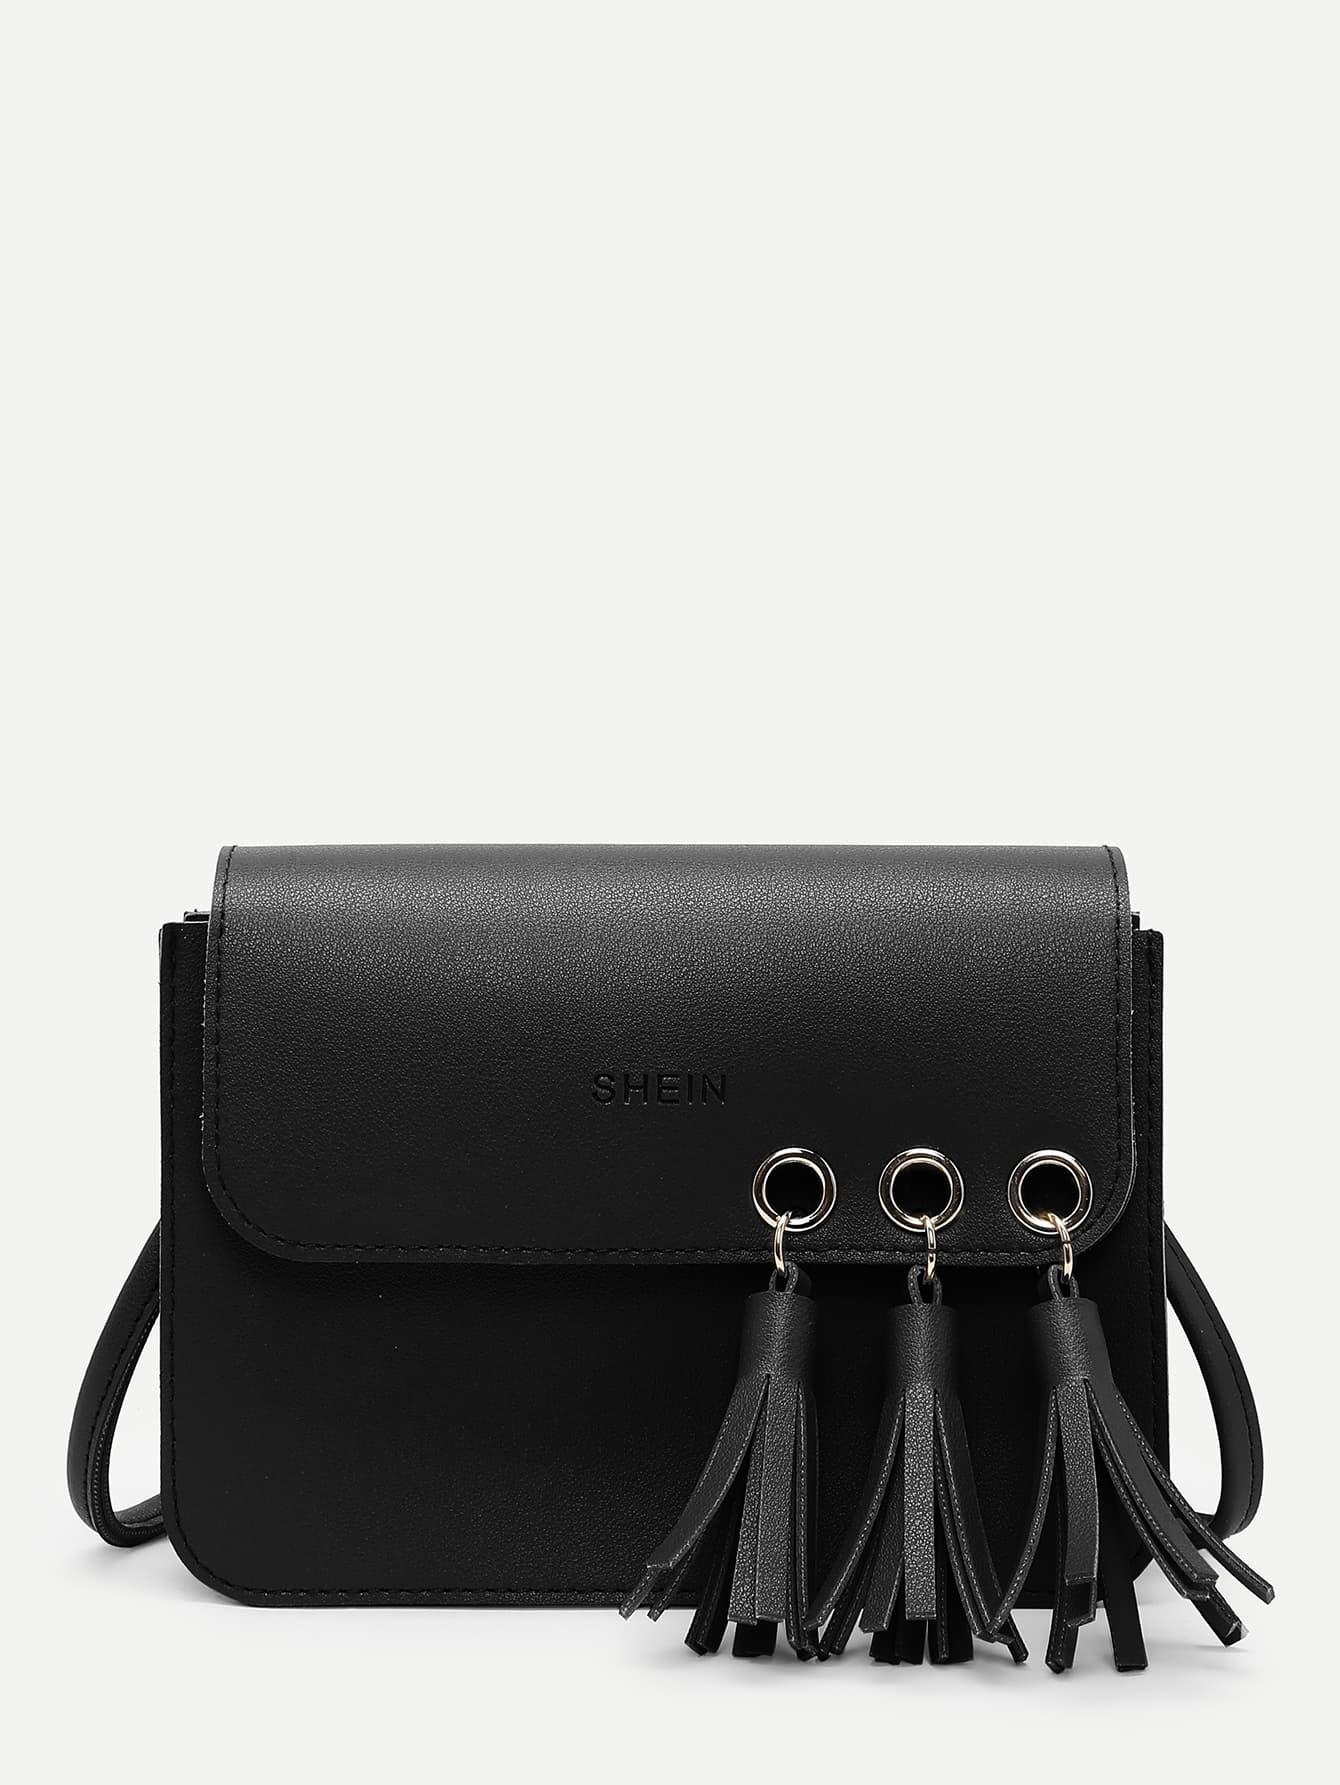 Tassel Decorated Flap PU Crossbody Bag tassel decorated velvet chain flap bag